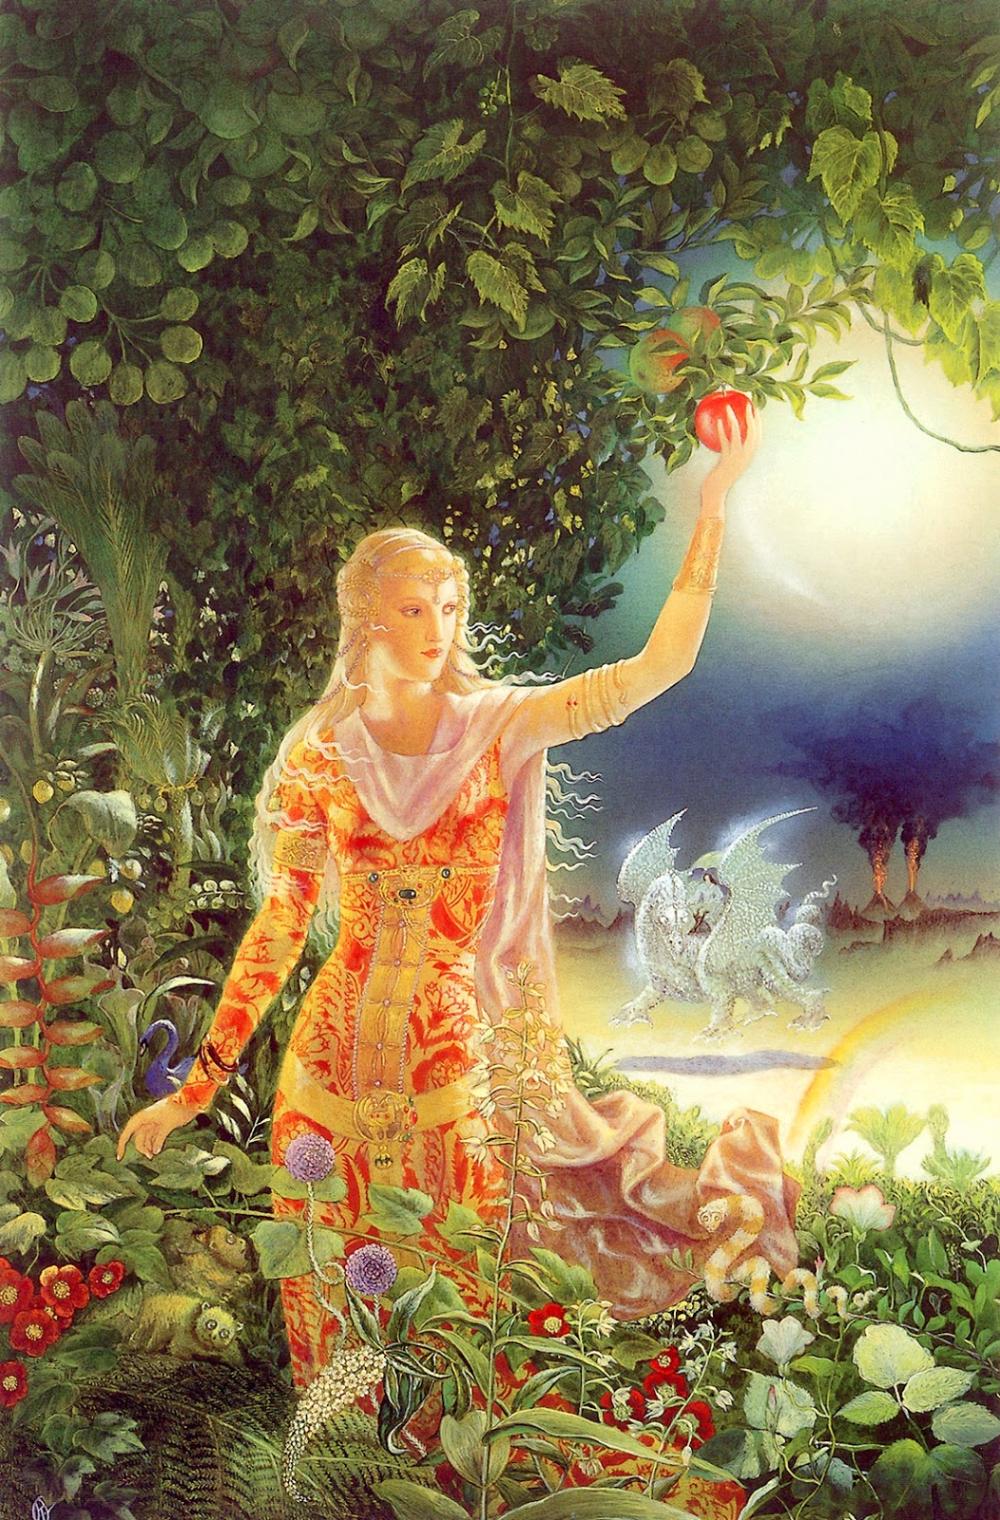 Kinuko Craft, 1940 in 2020 Art, Painting, Fairytale art